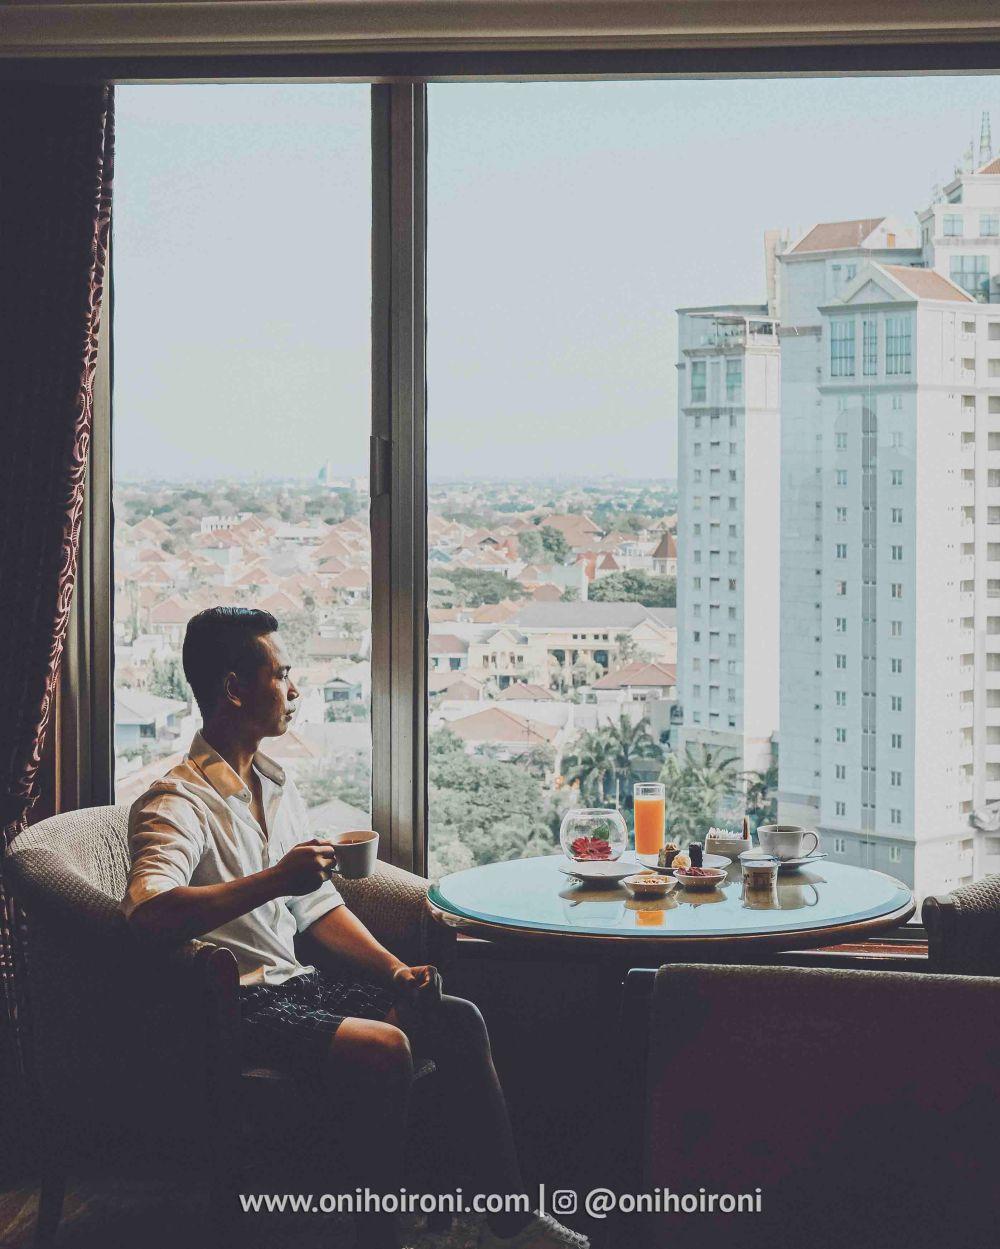 6 Review Horizon Club Lounge Shangrila Surabaya Hotel Oni hoironi